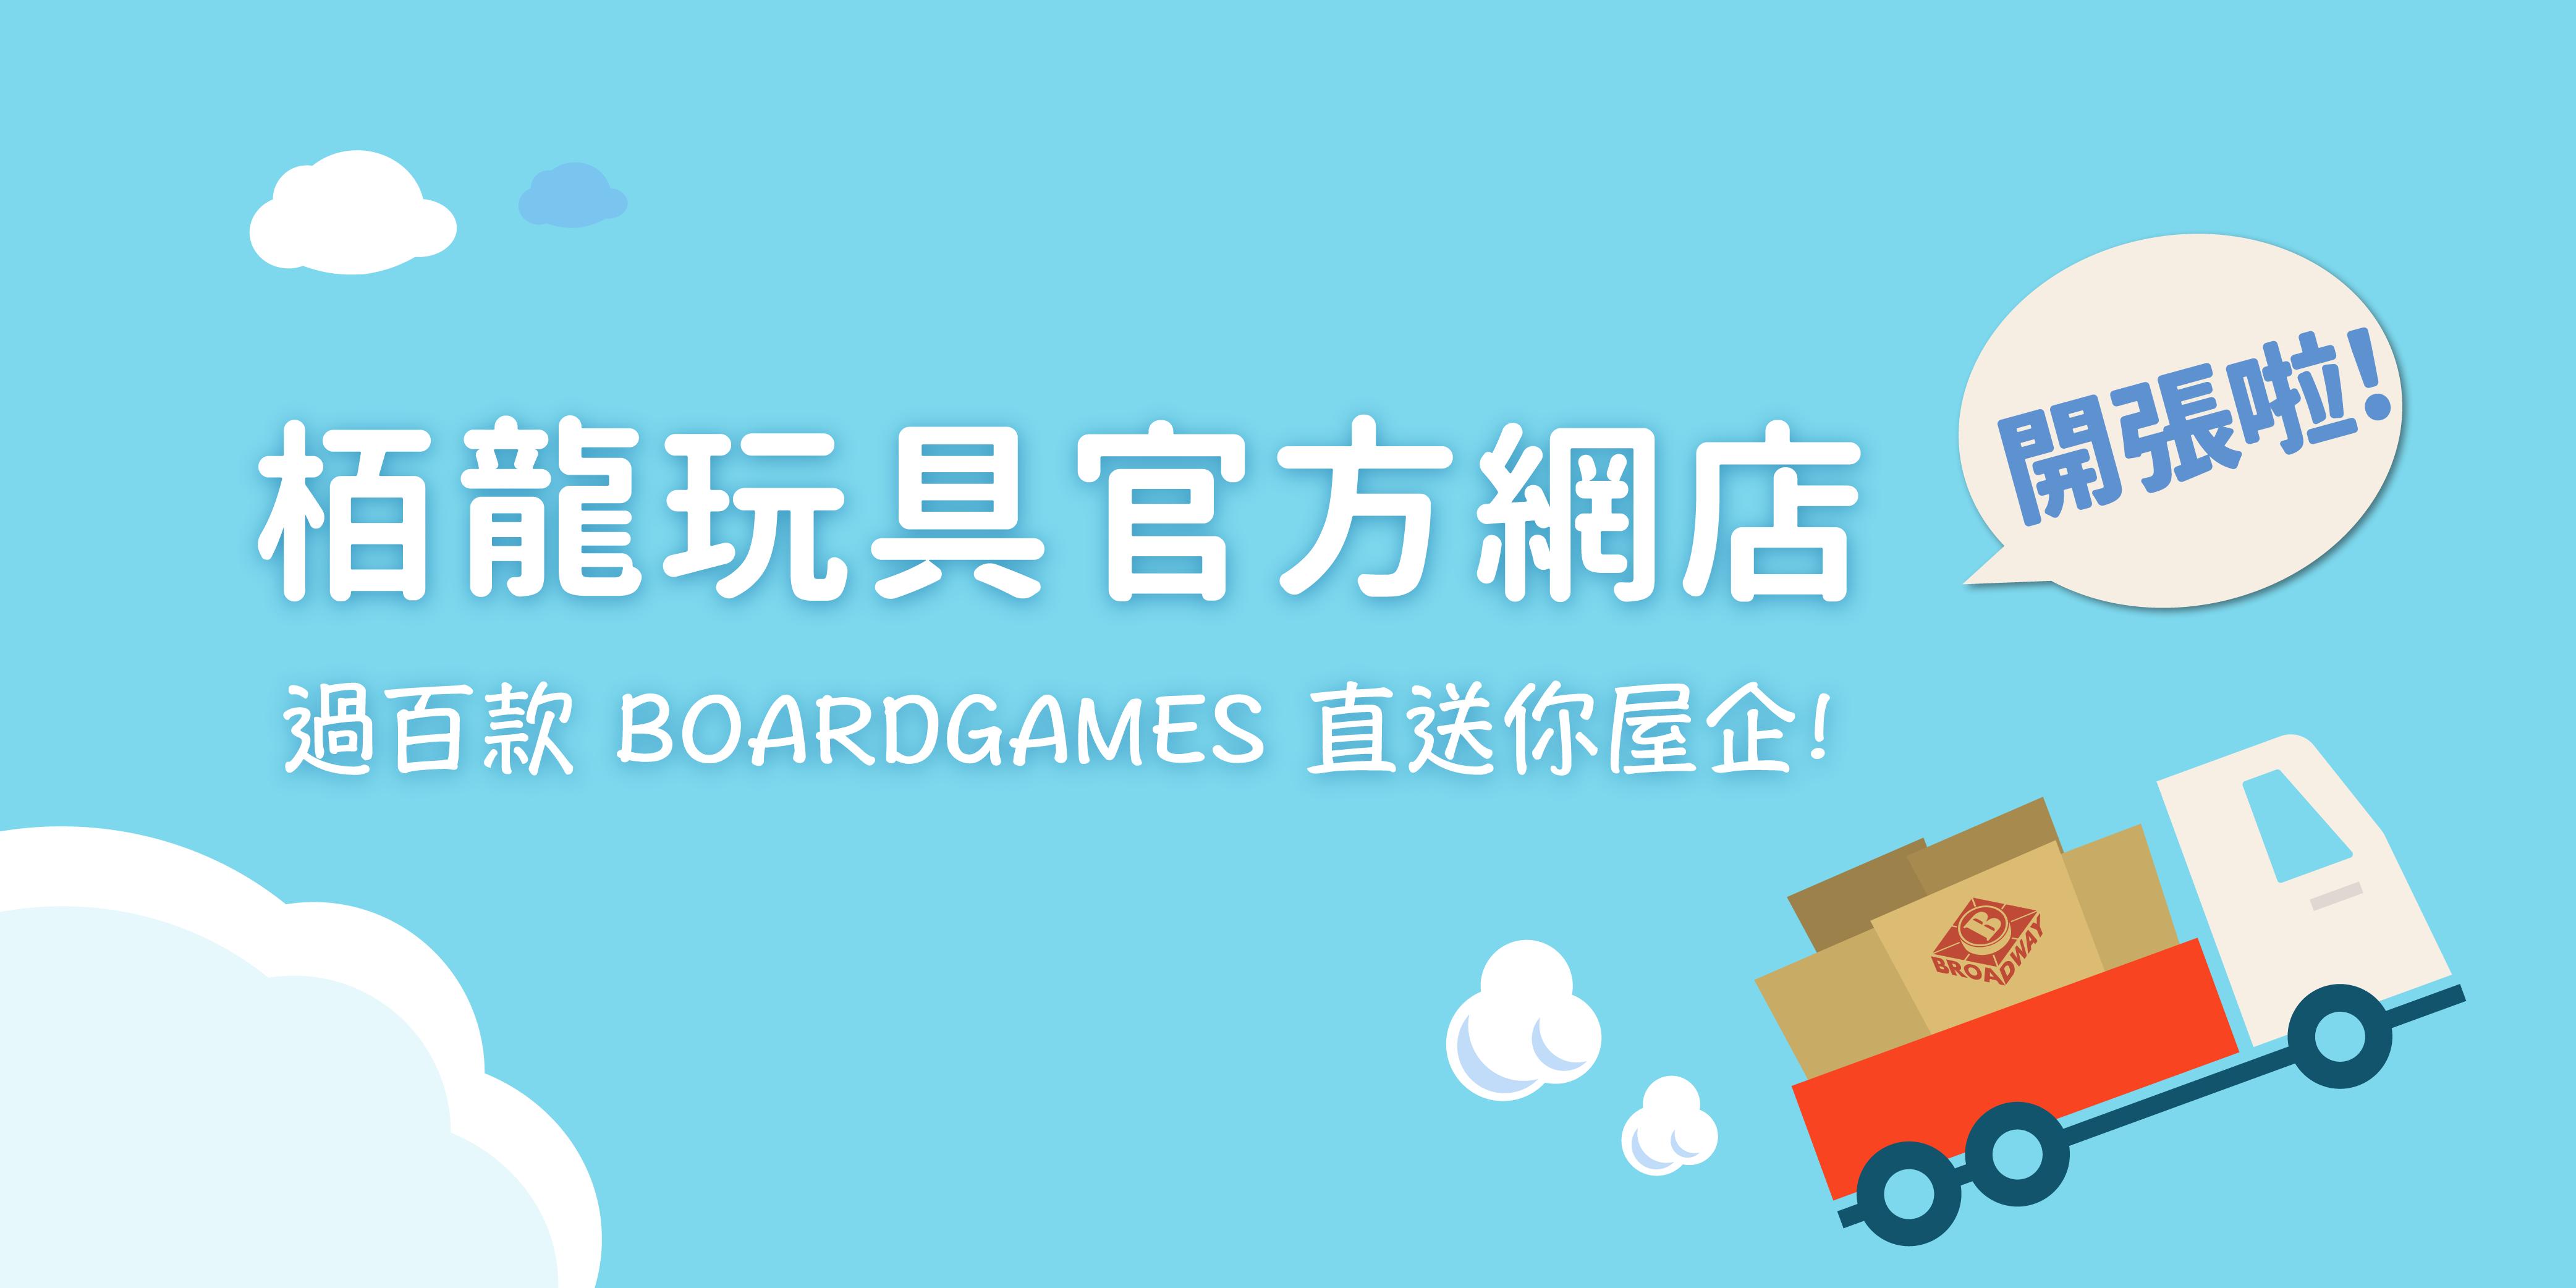 http://broadwaygames.com.hk/wp-content/uploads/2020/08/Banner_online-shop_2000px-01.png